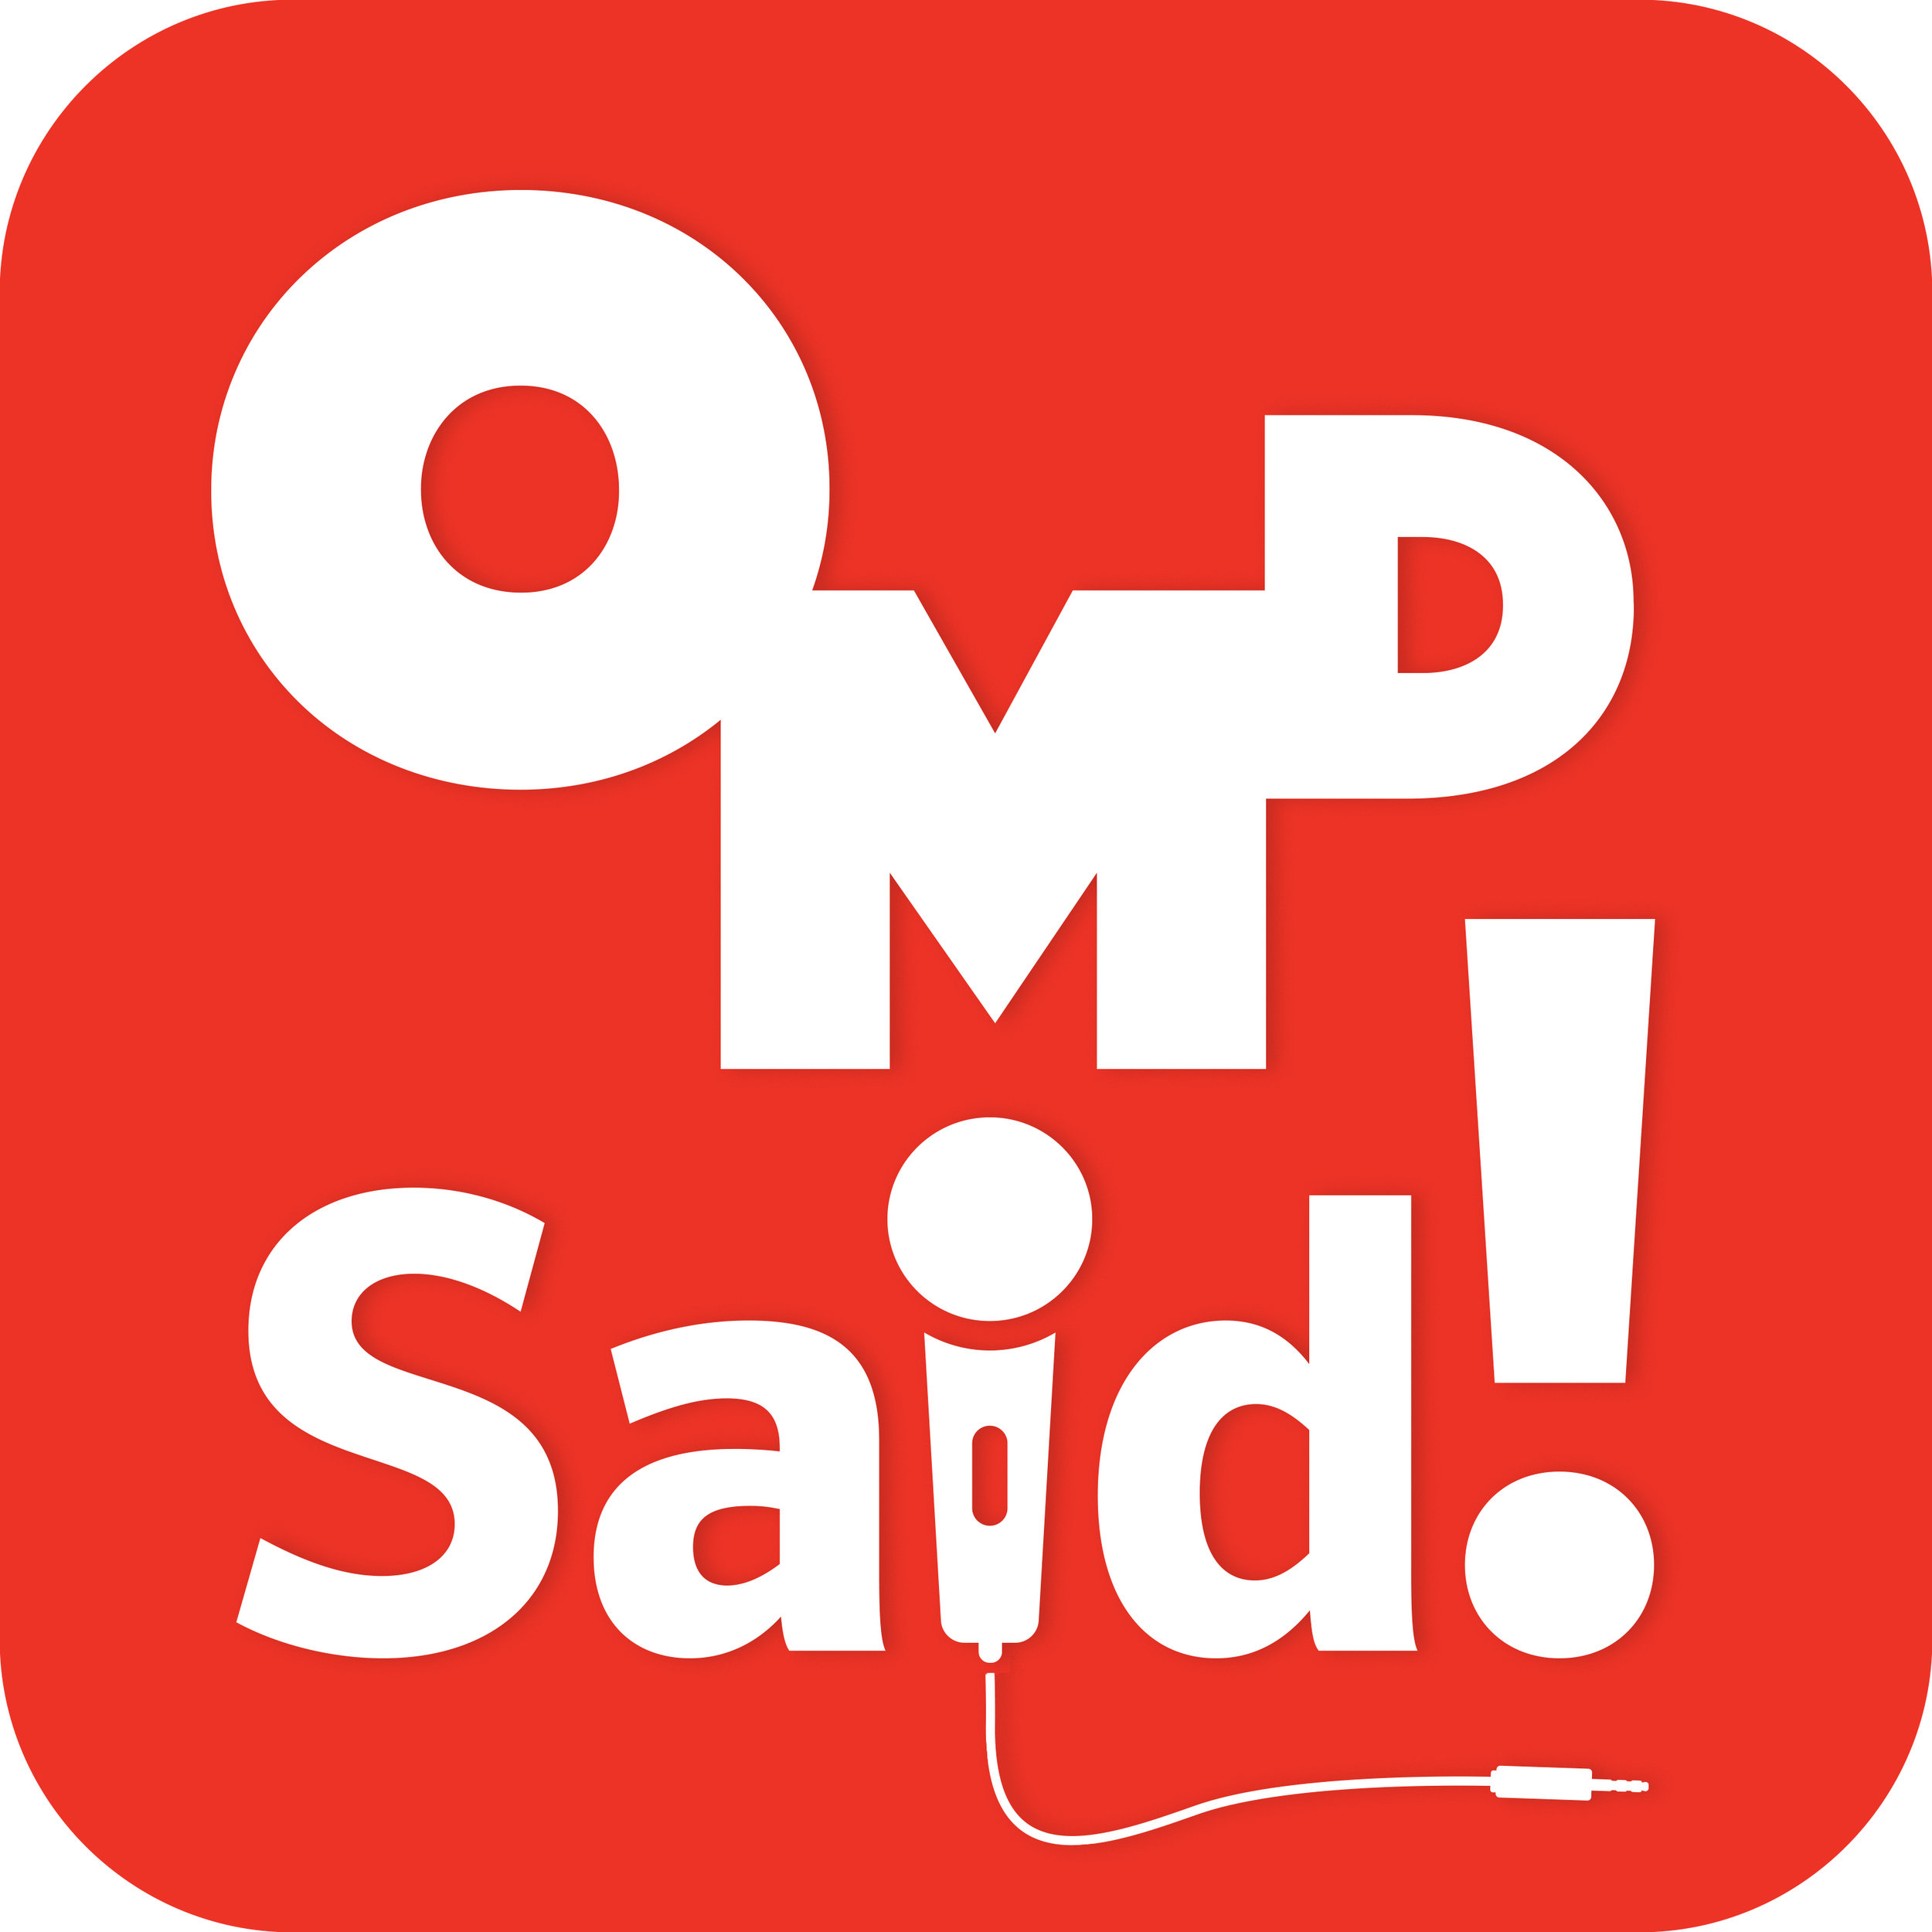 OMD Said Podcast Artwork- app window.jpg